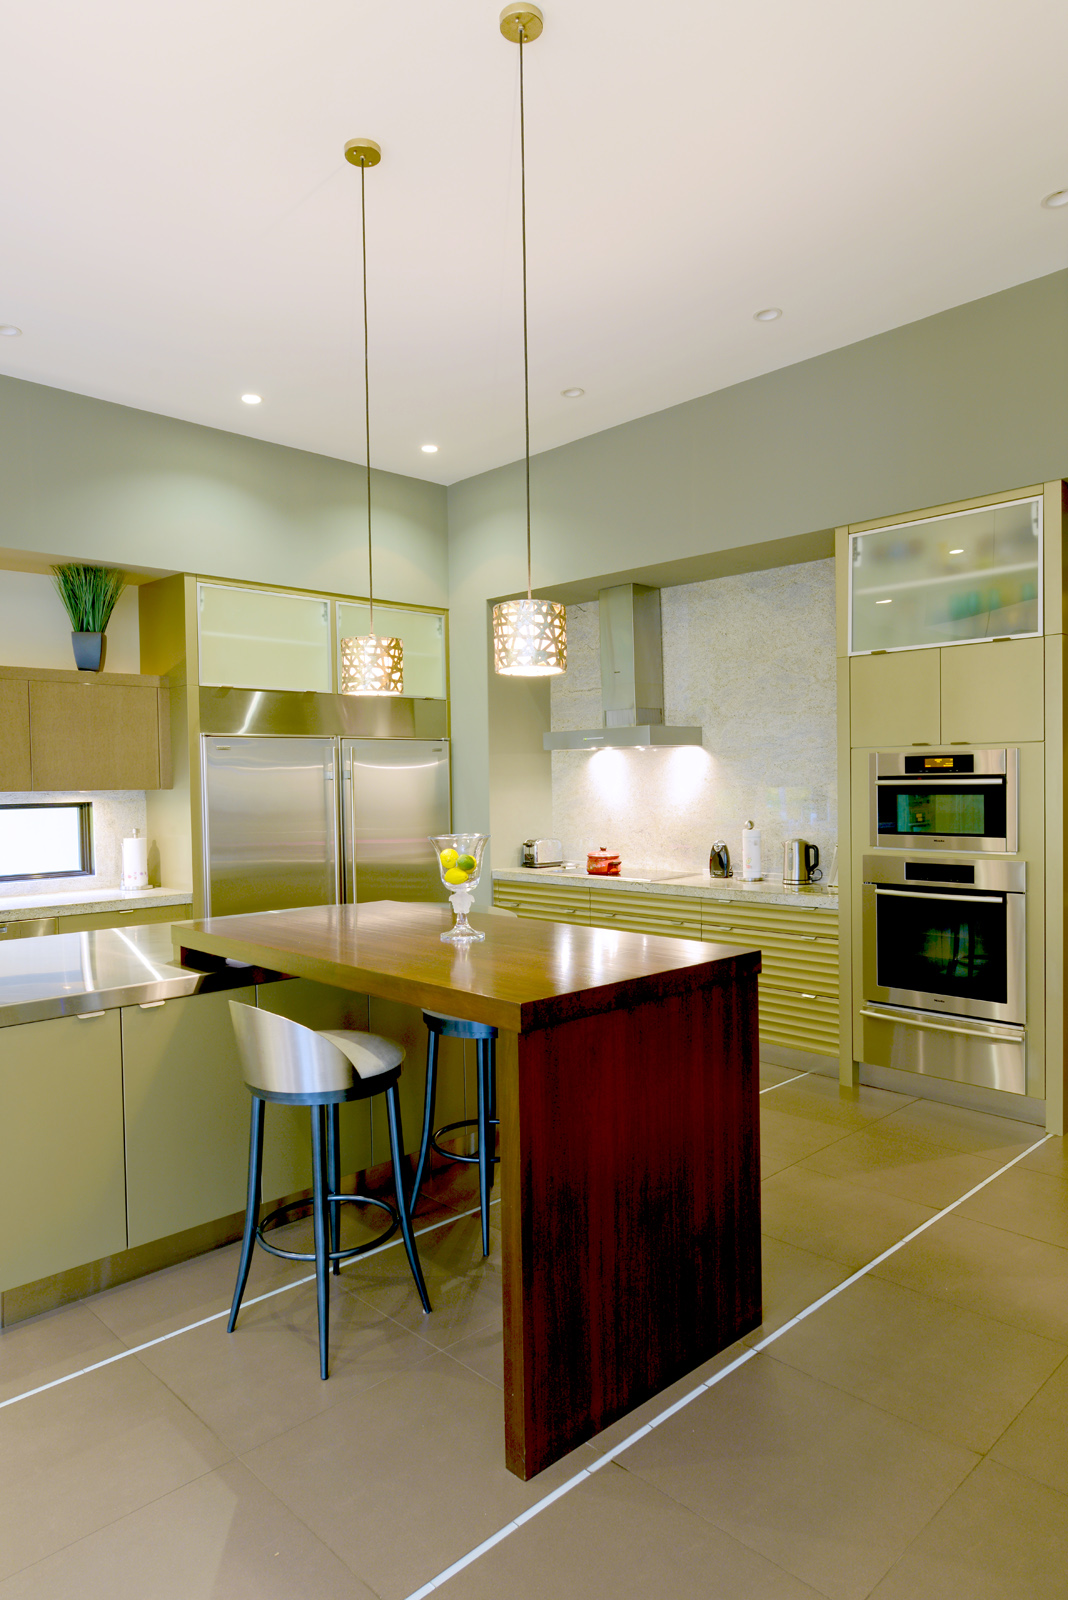 SHA_Kitchen (3)_CC.jpg